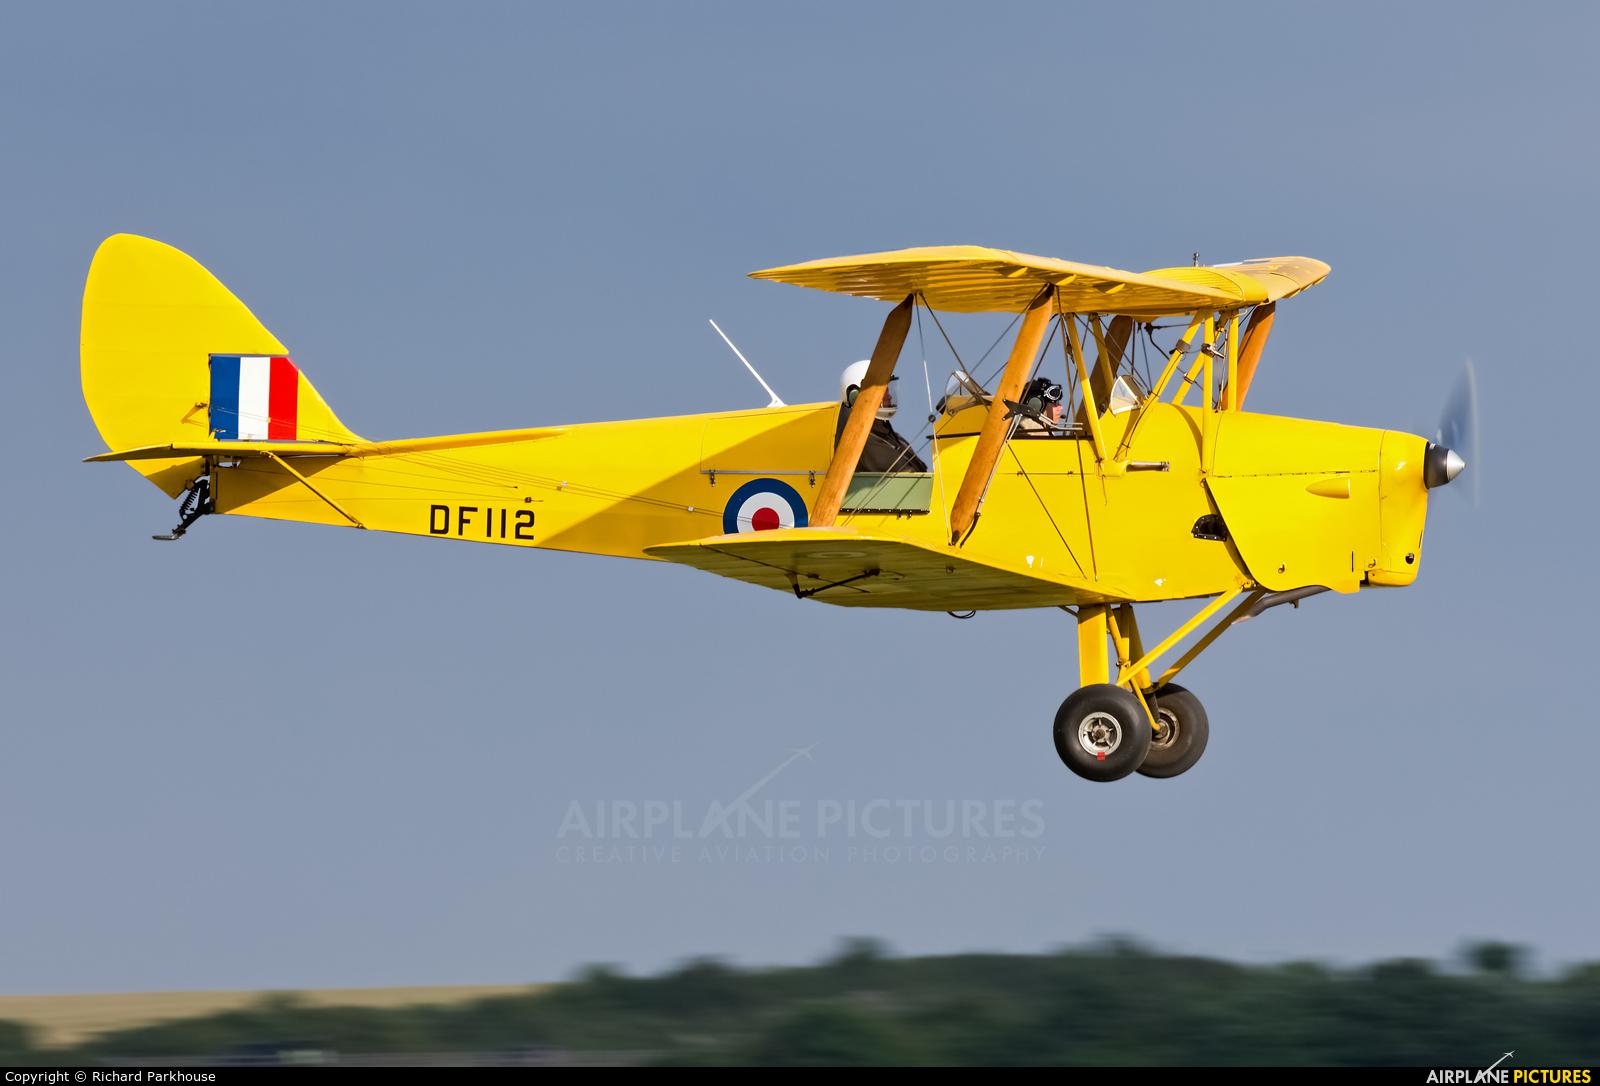 Spectrum Leisure G-ANRM aircraft at Duxford